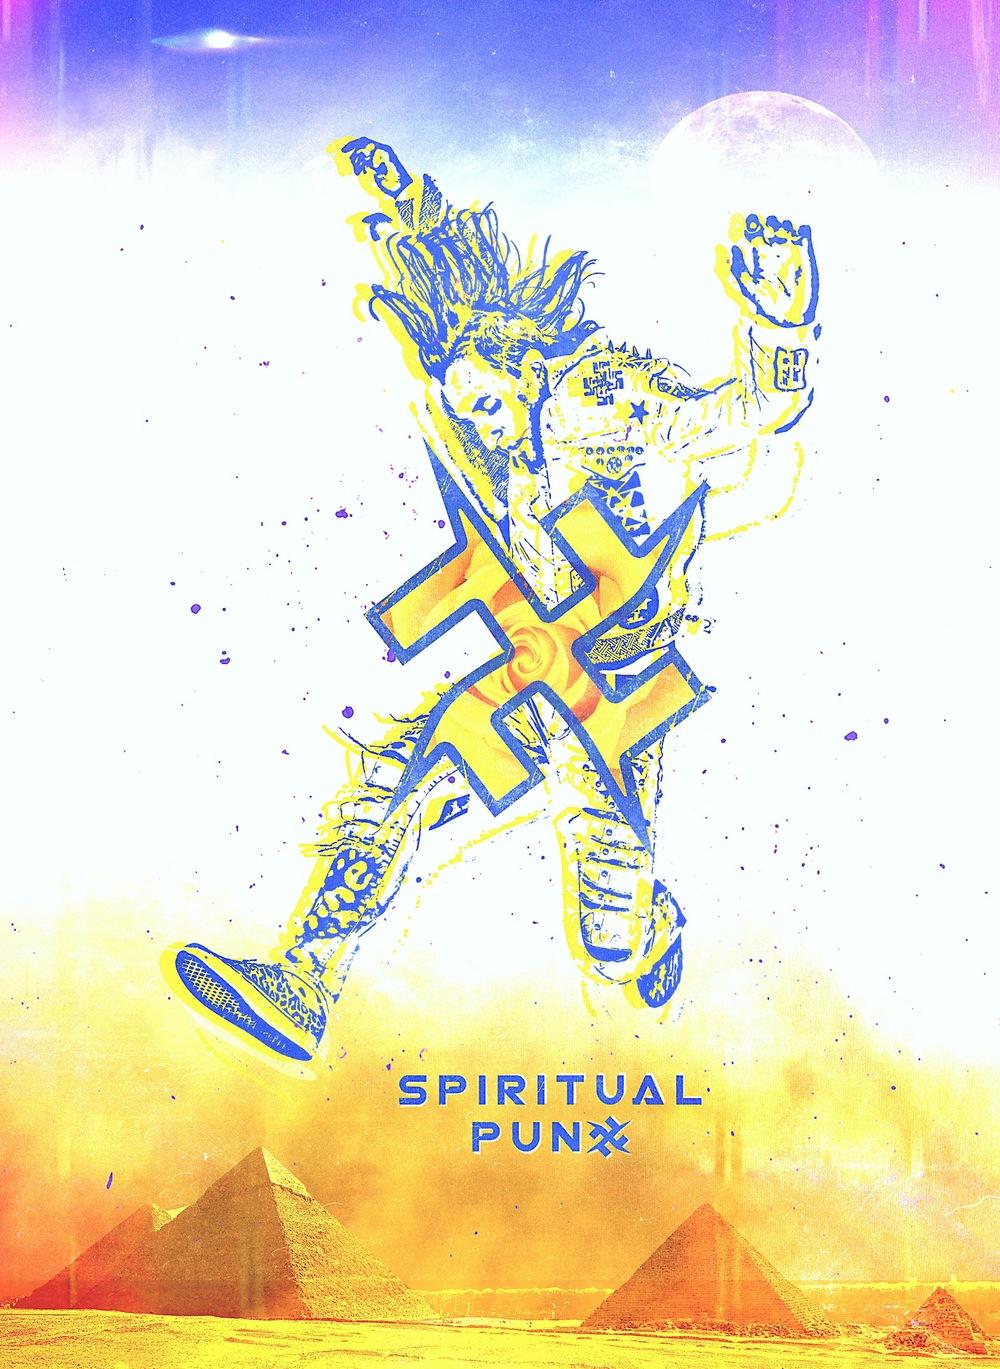 Spiritual Punx - Jump